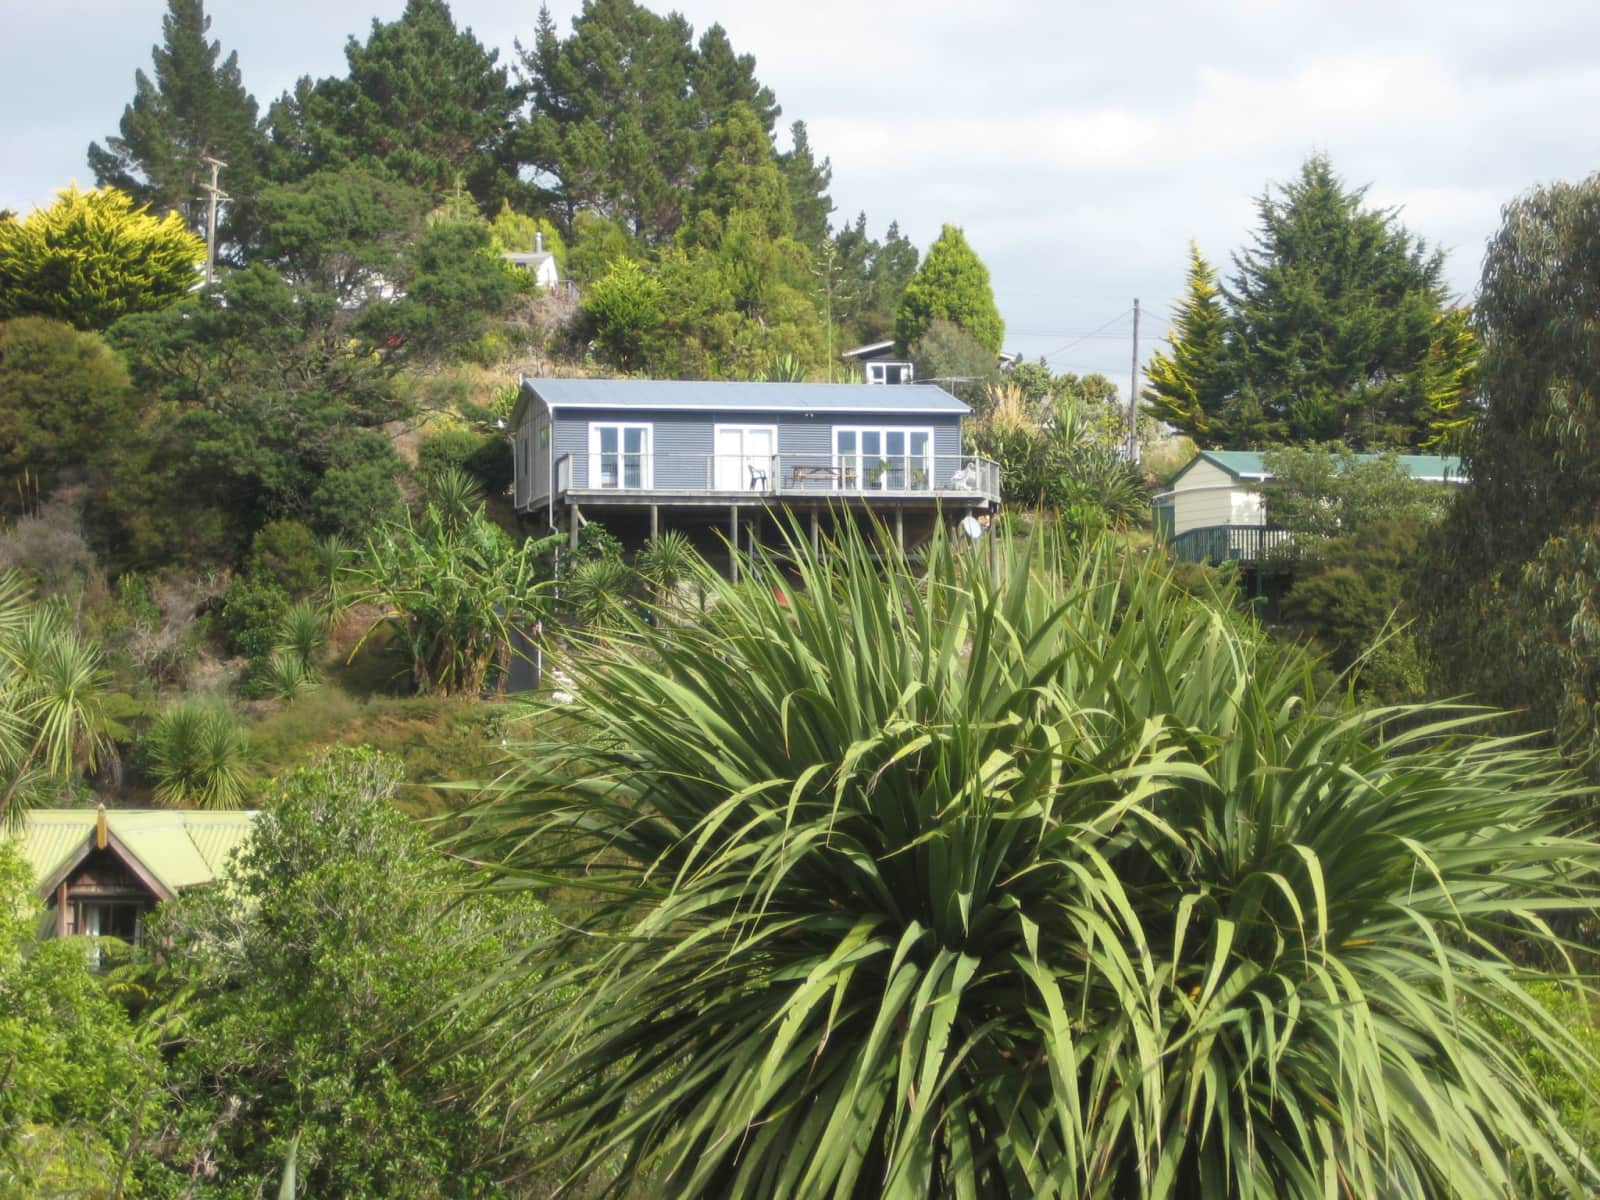 Housesitting Assignment In Waikopua, New Zealand